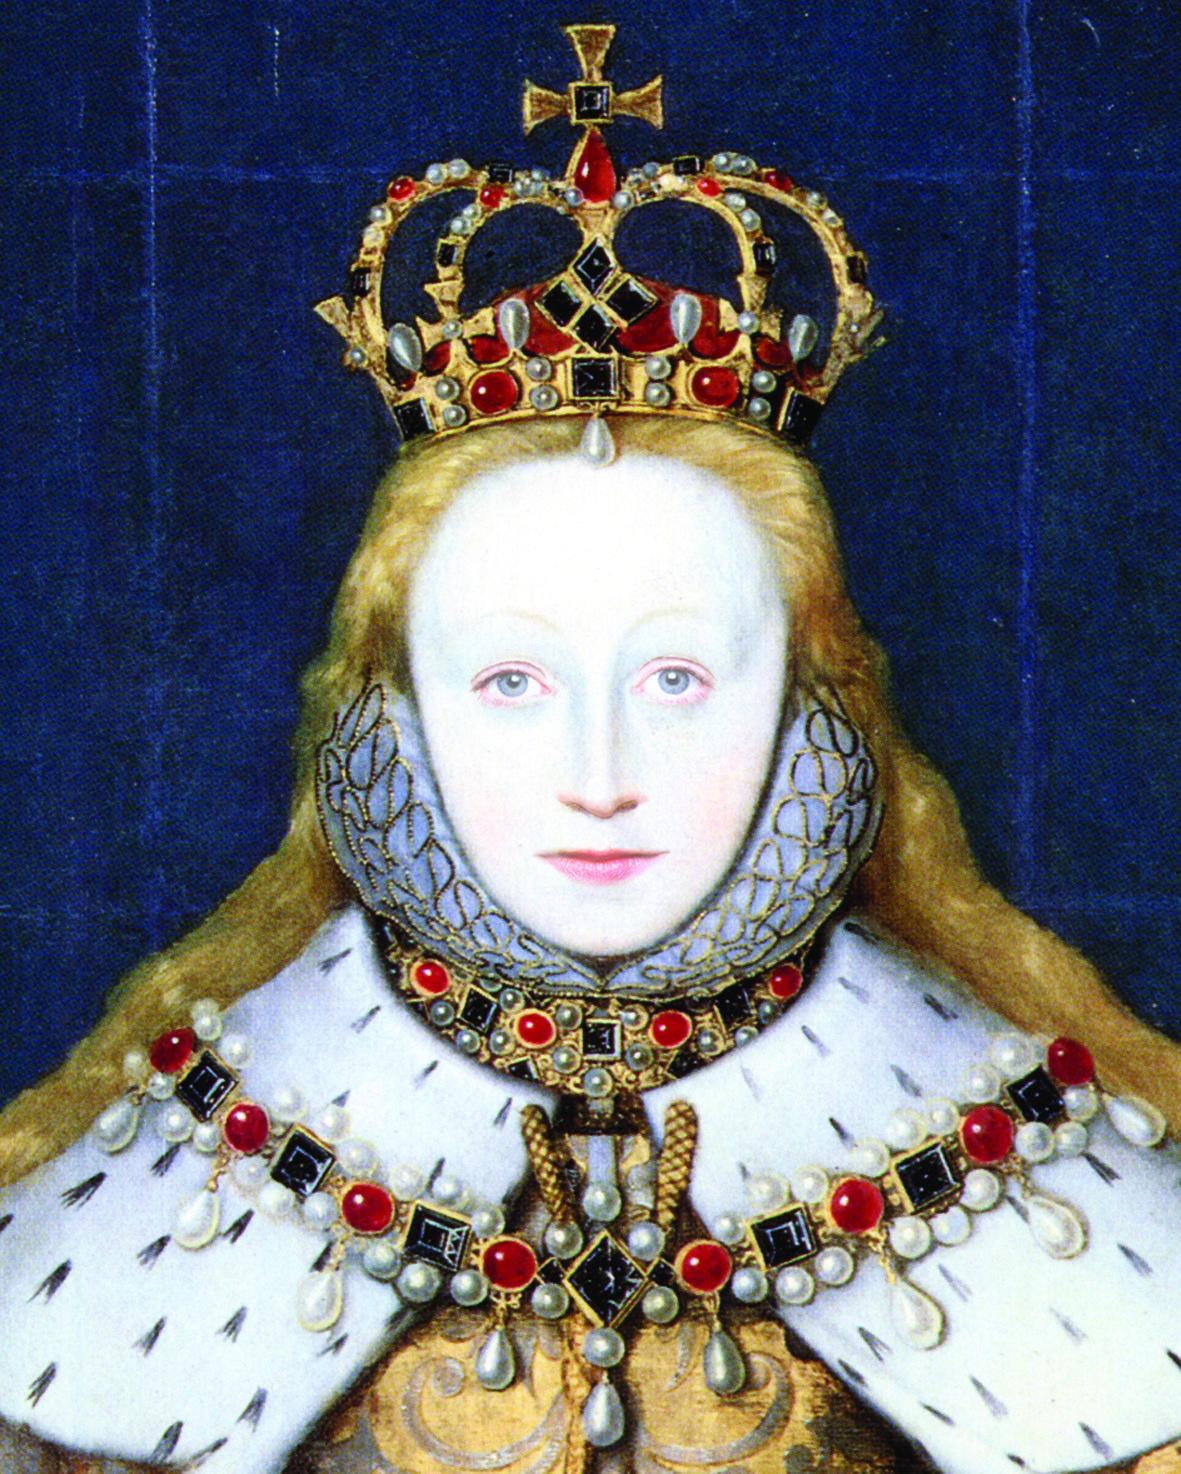 Young Elizabeth Elizabeth I in her coronation robes